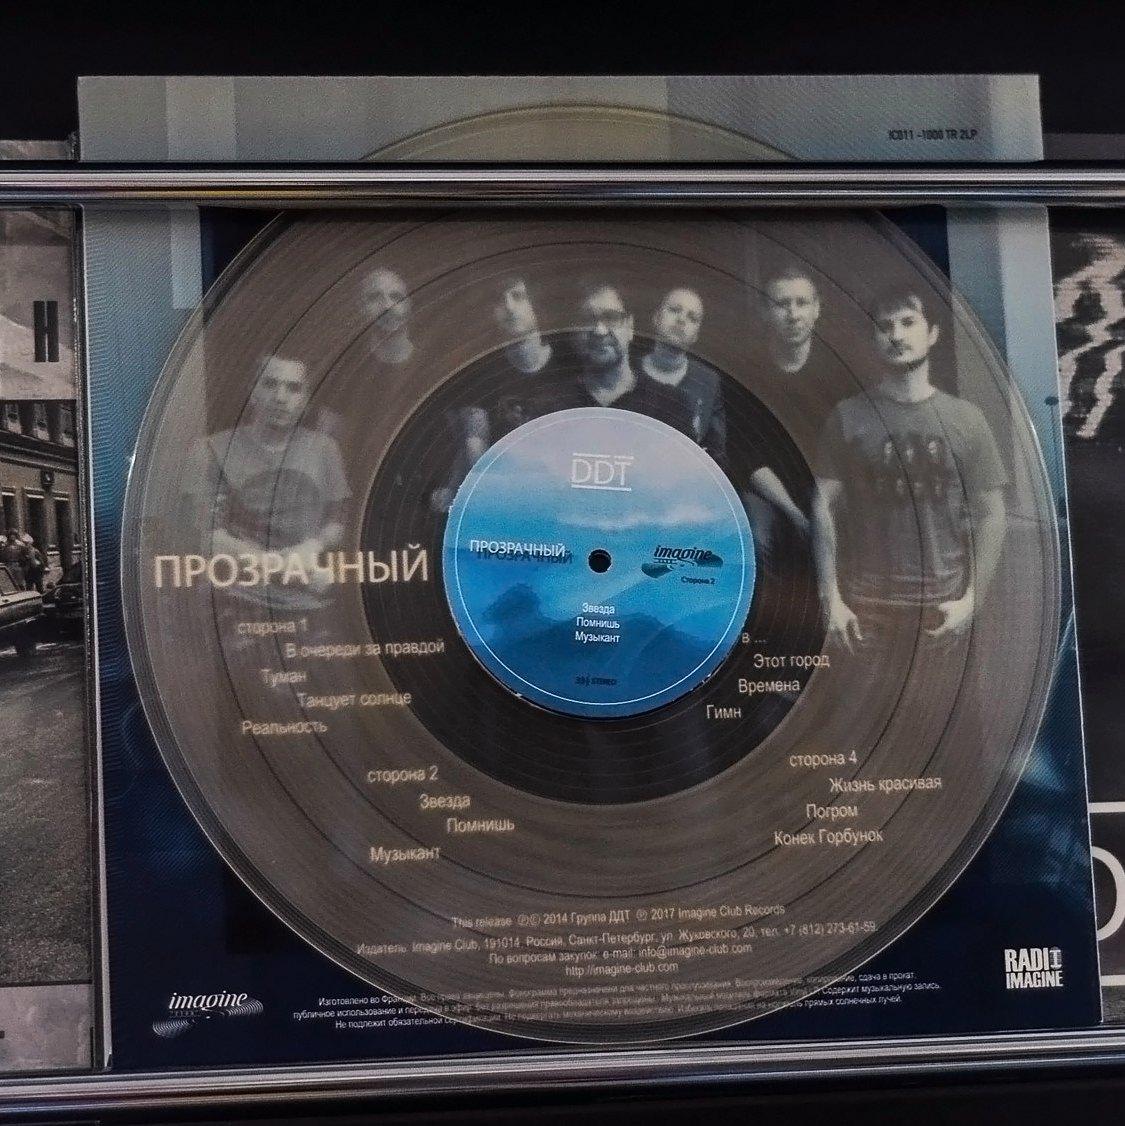 Последний альбом ДДТ издадут на виниле